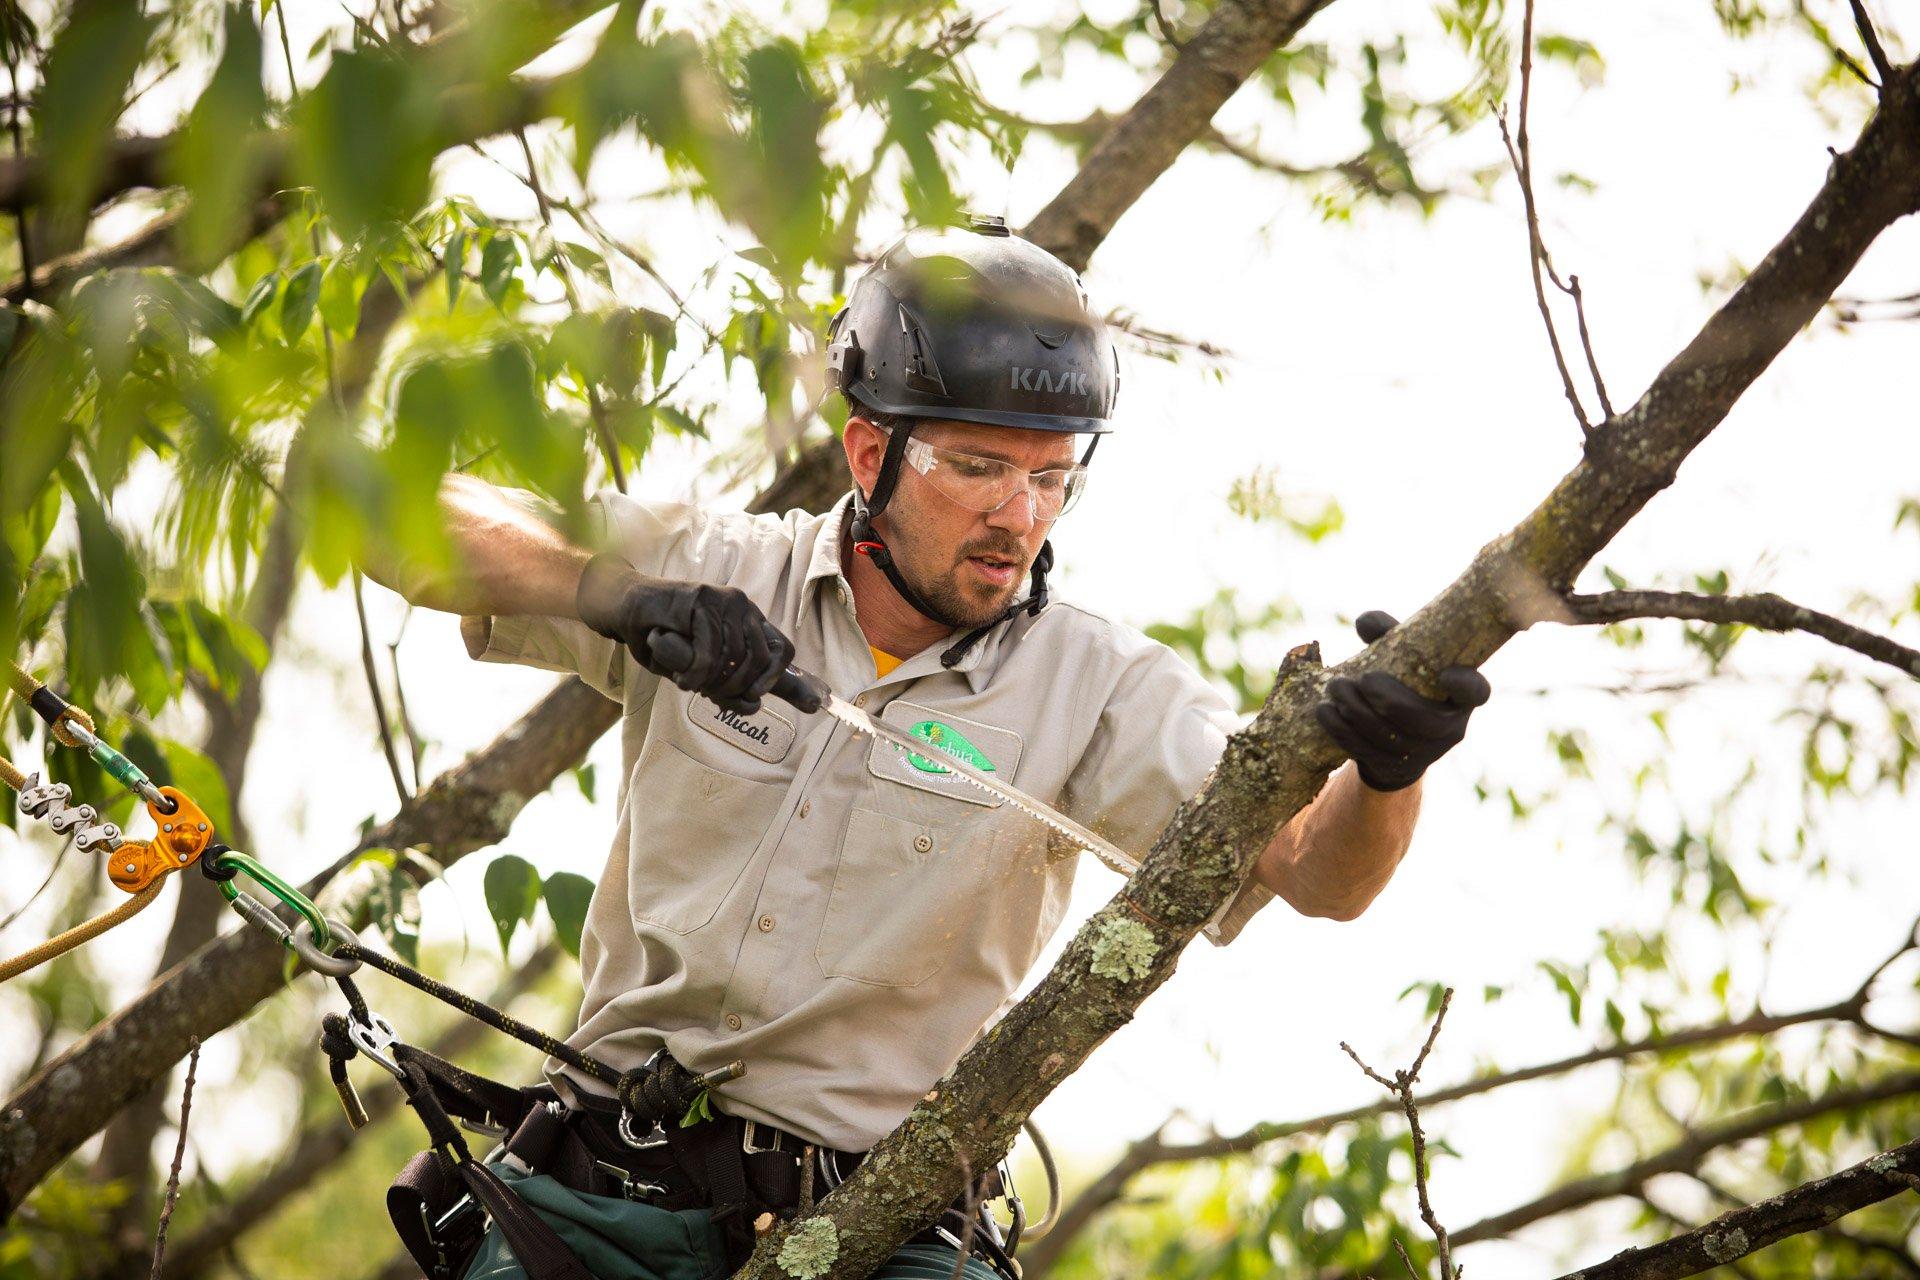 tree-climbing-pruning-technician-16